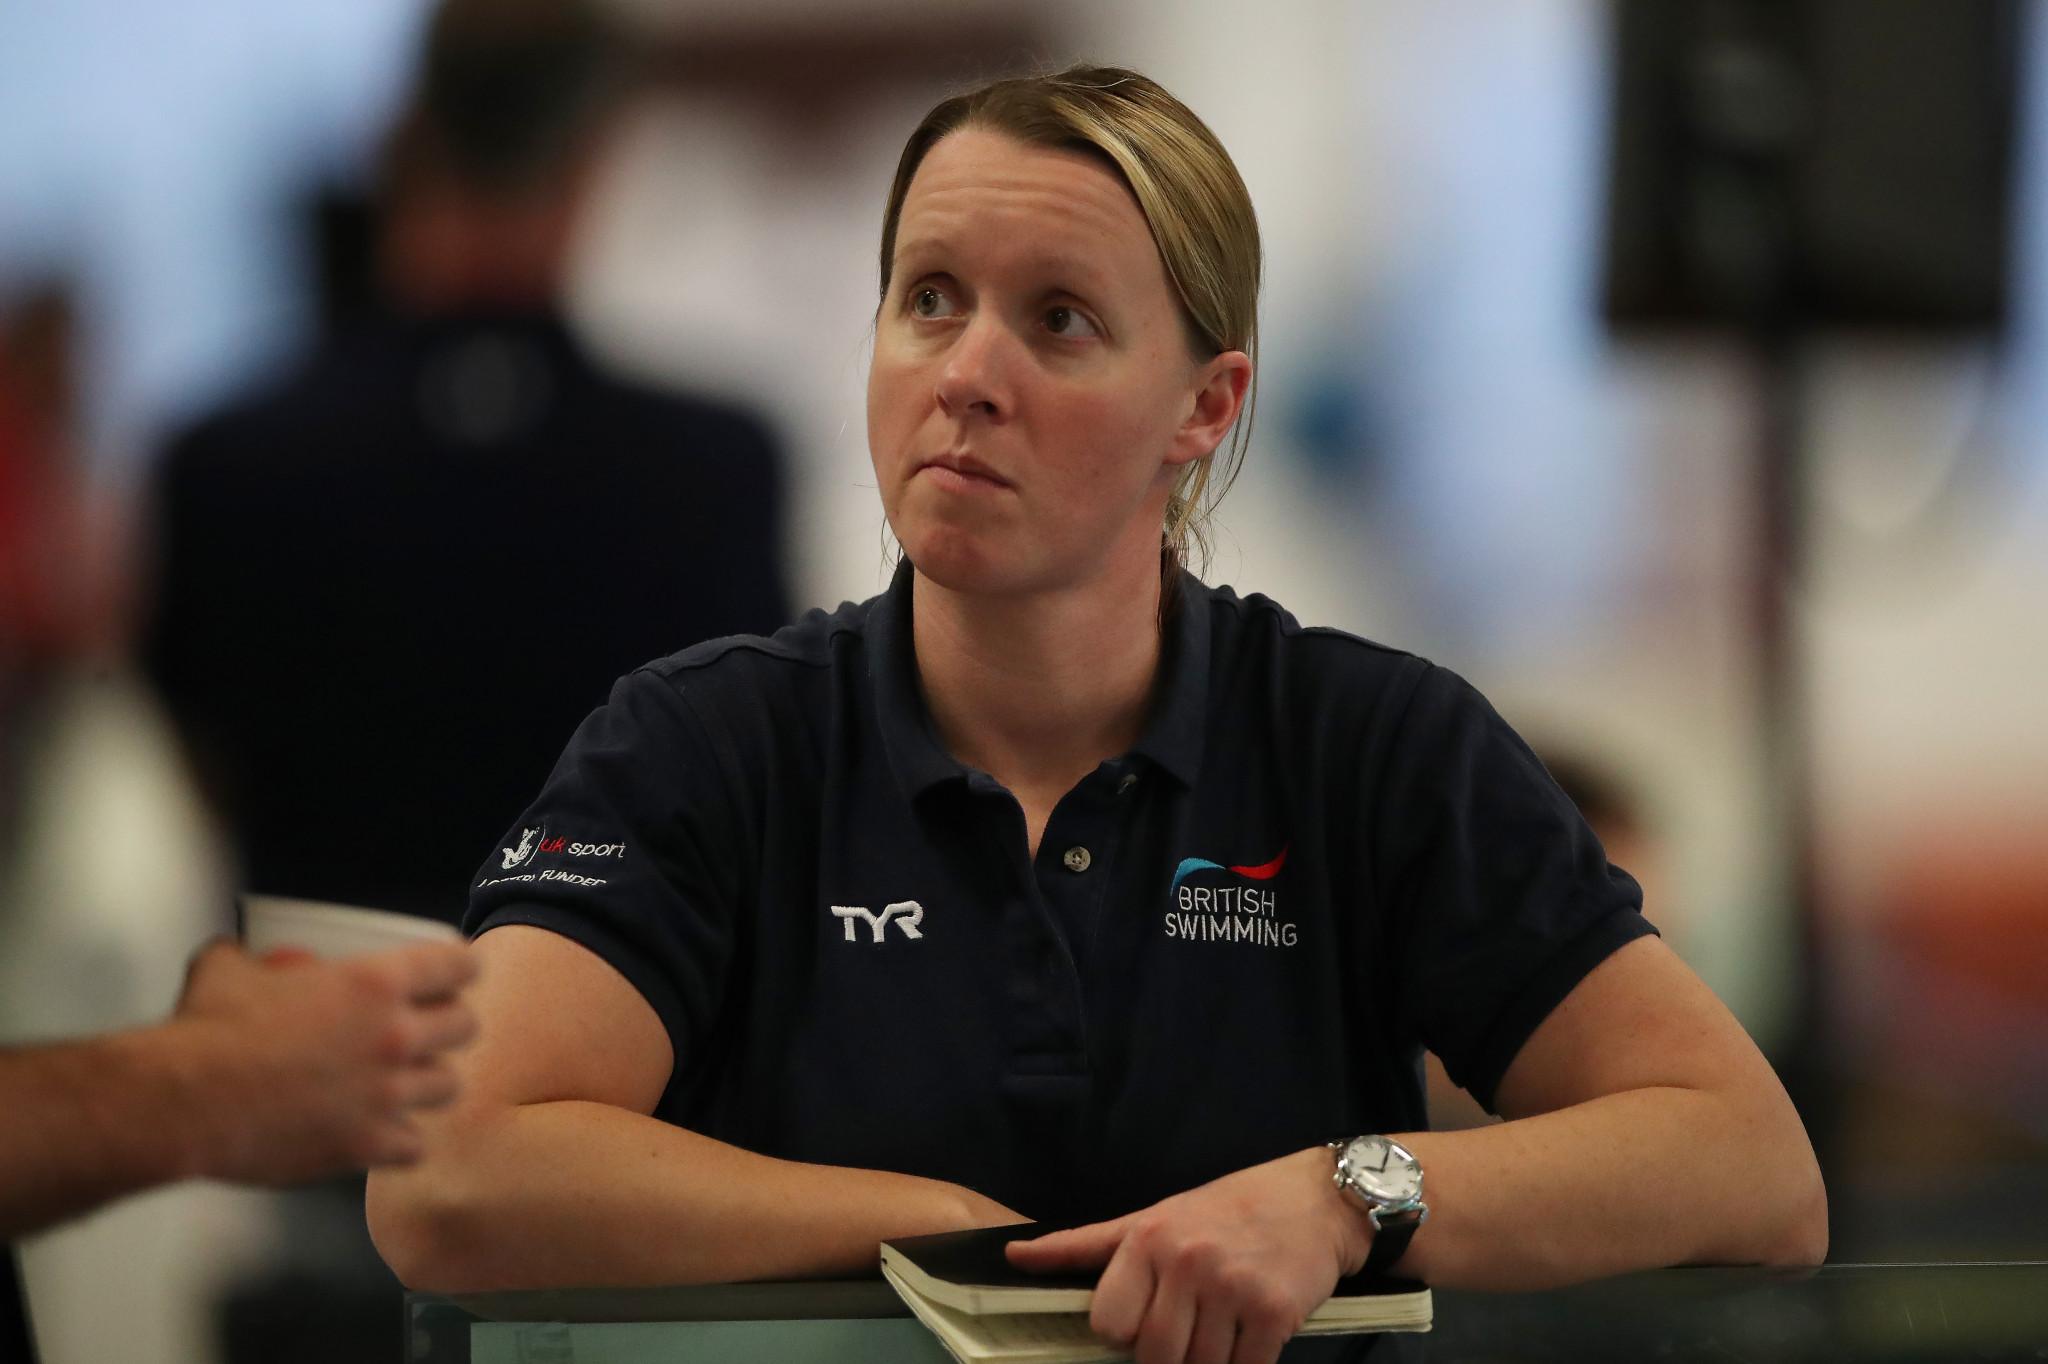 UK Sport announces programme to double representation of female coaches by Paris 2024